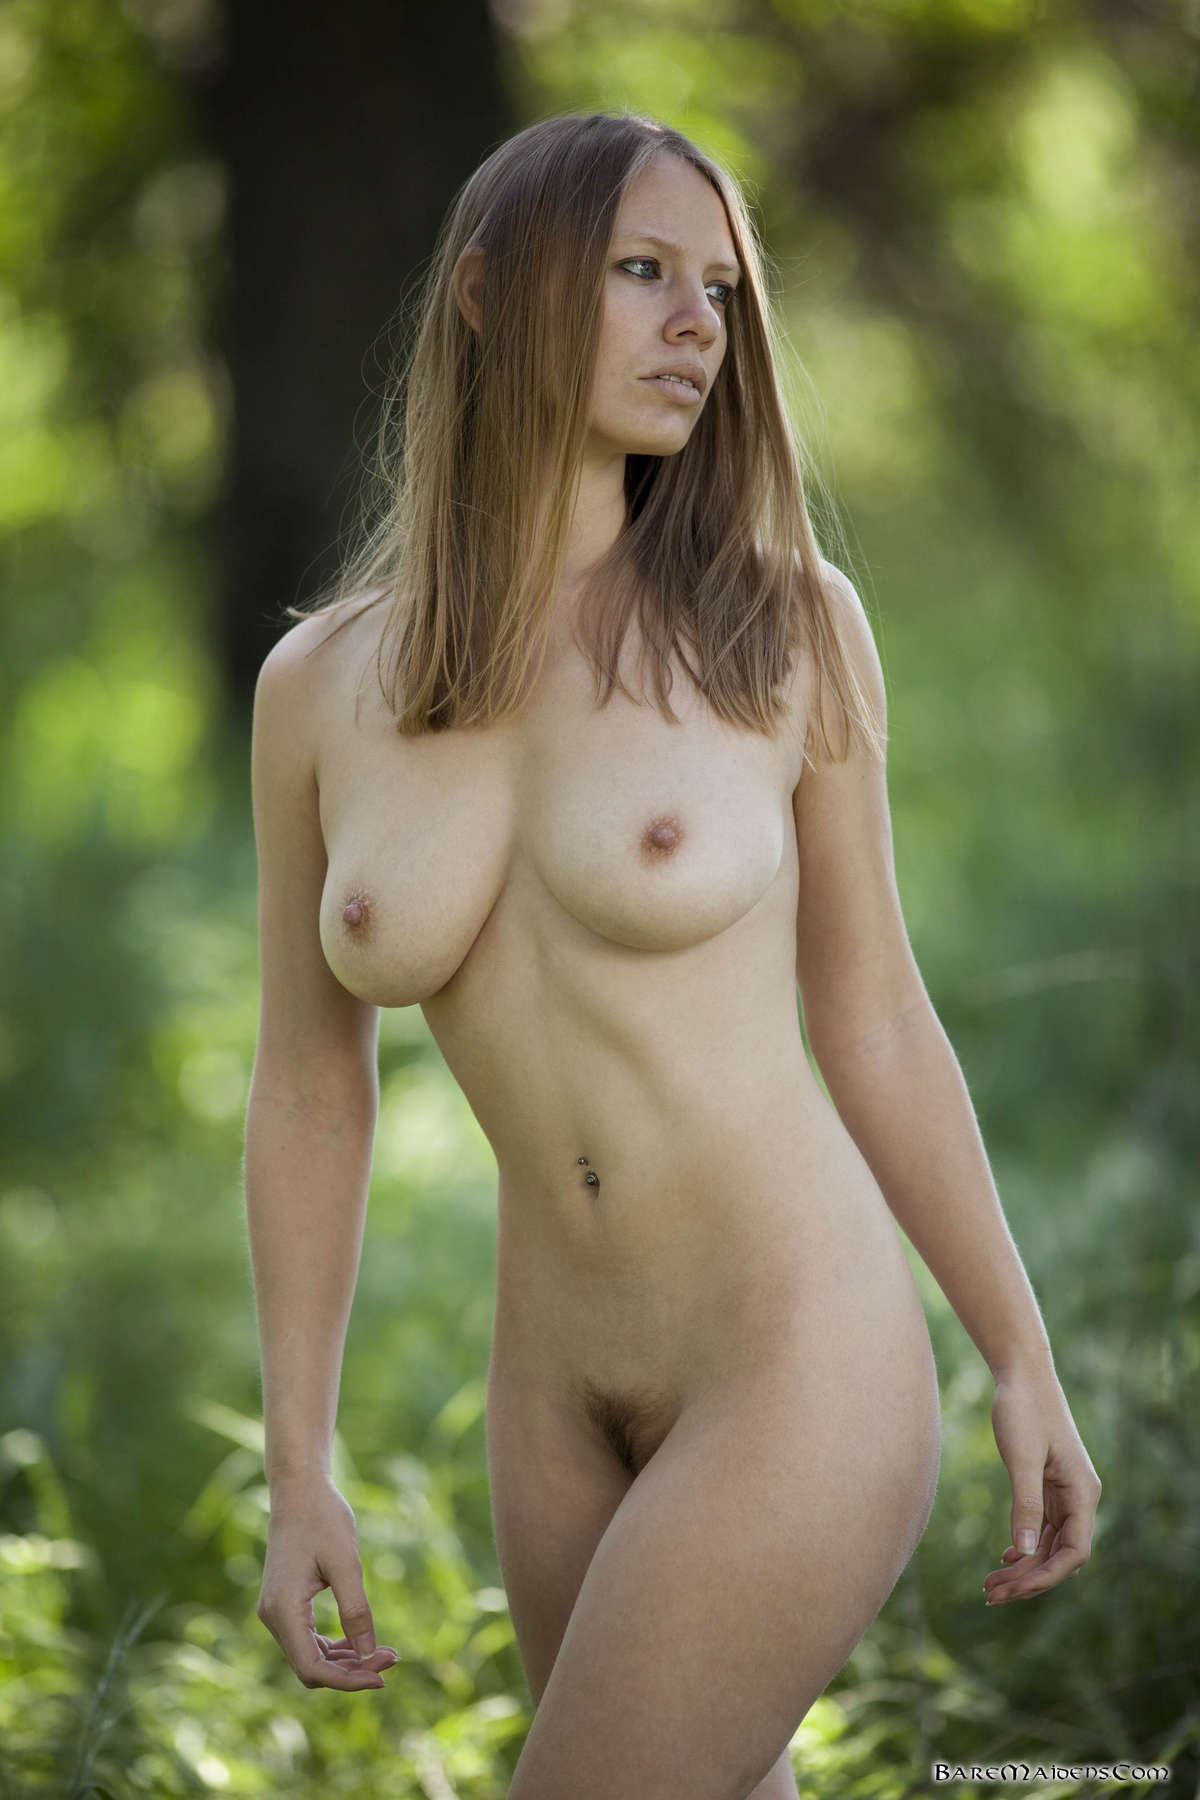 Baremwidends Porn Film Online Free sexy fantasy images zebragirls pictures – texansprosale